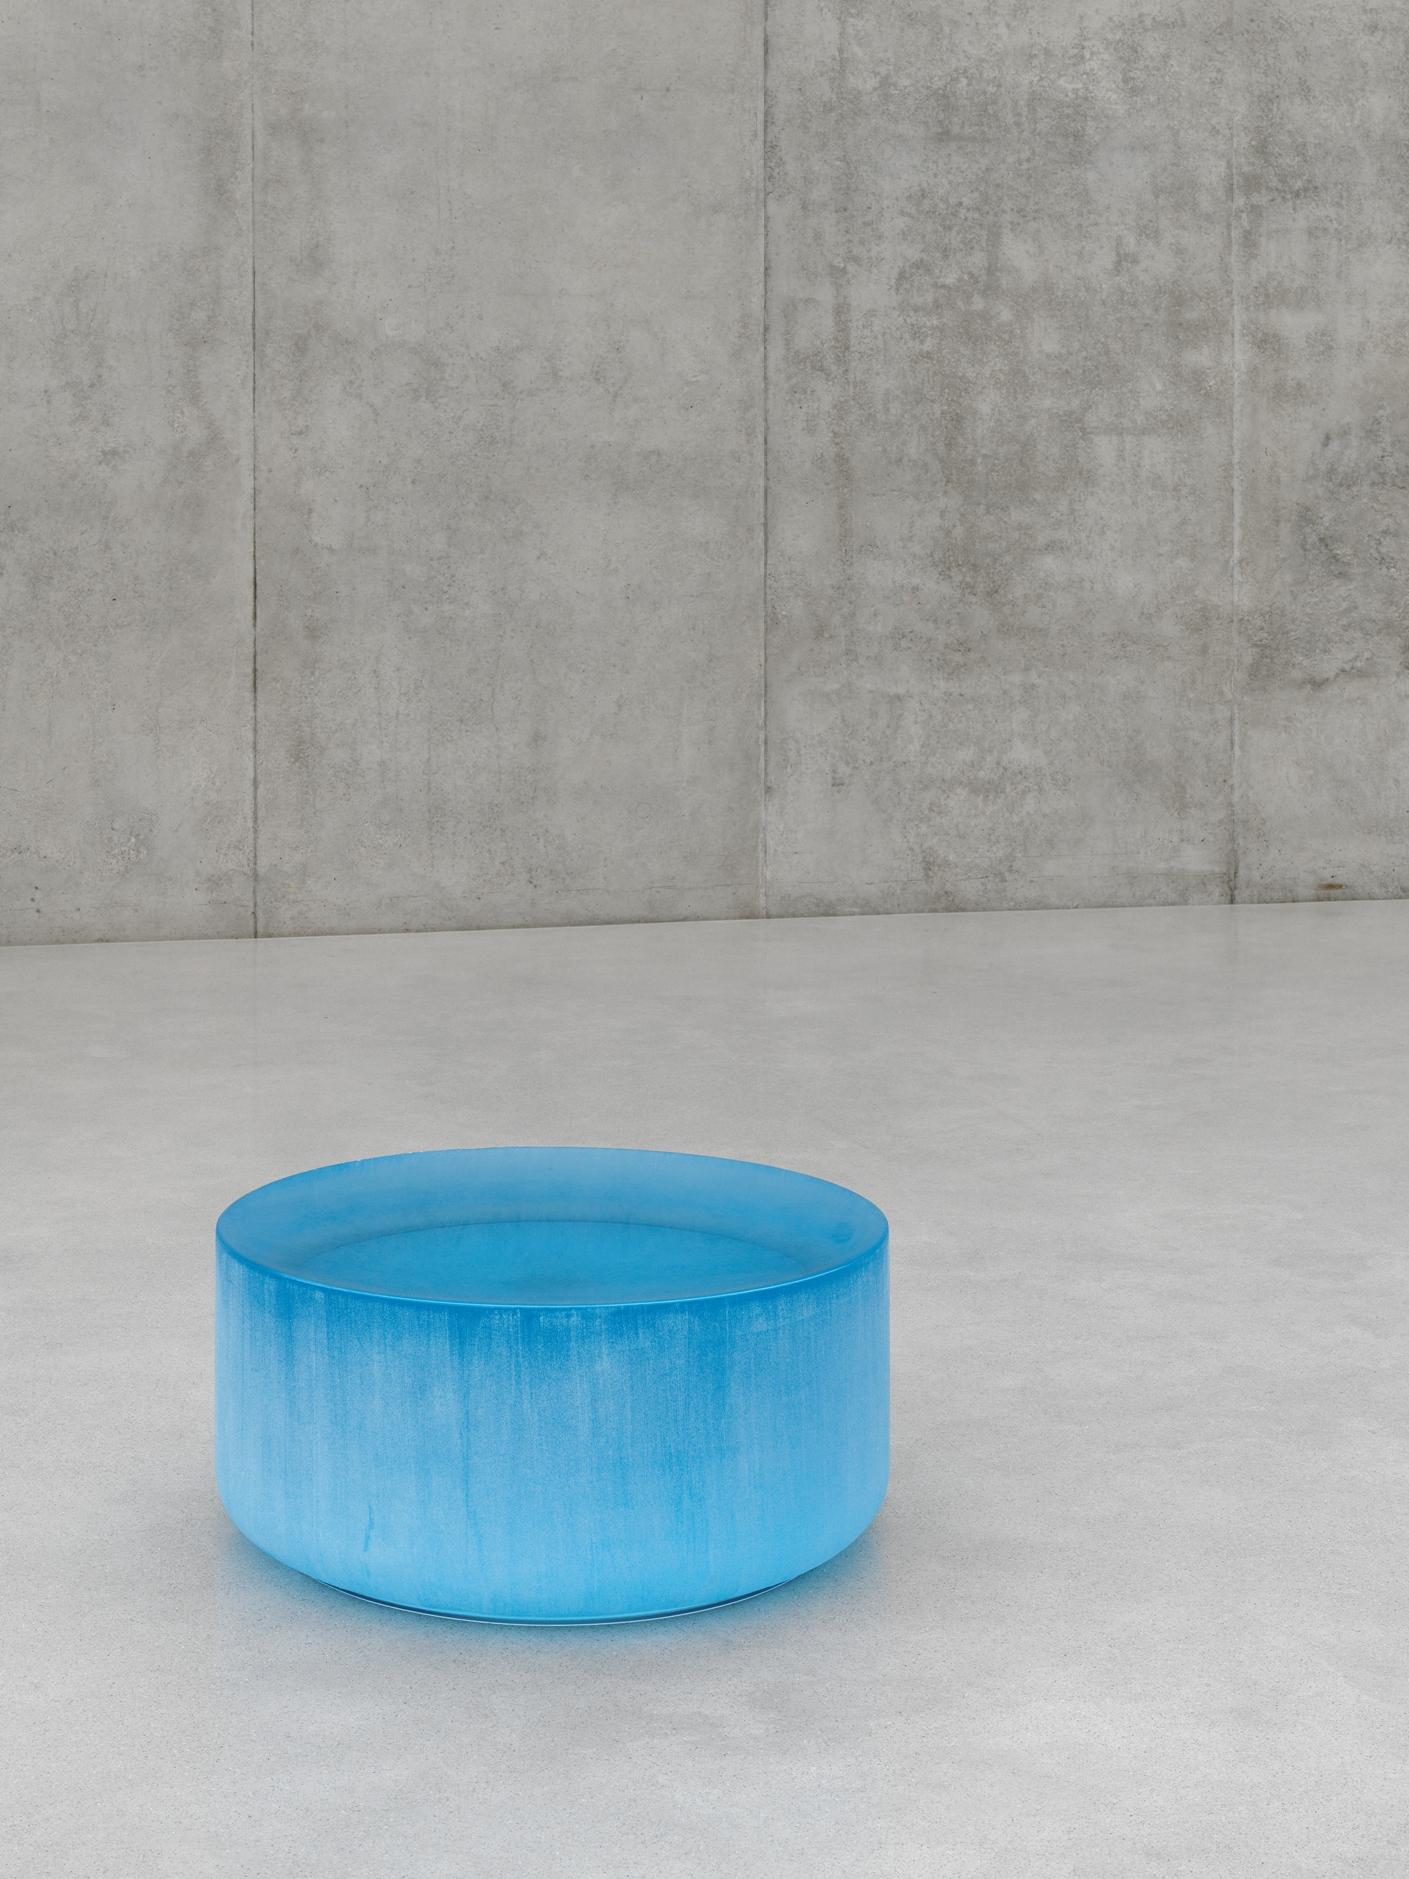 horn-untitled-sculpture